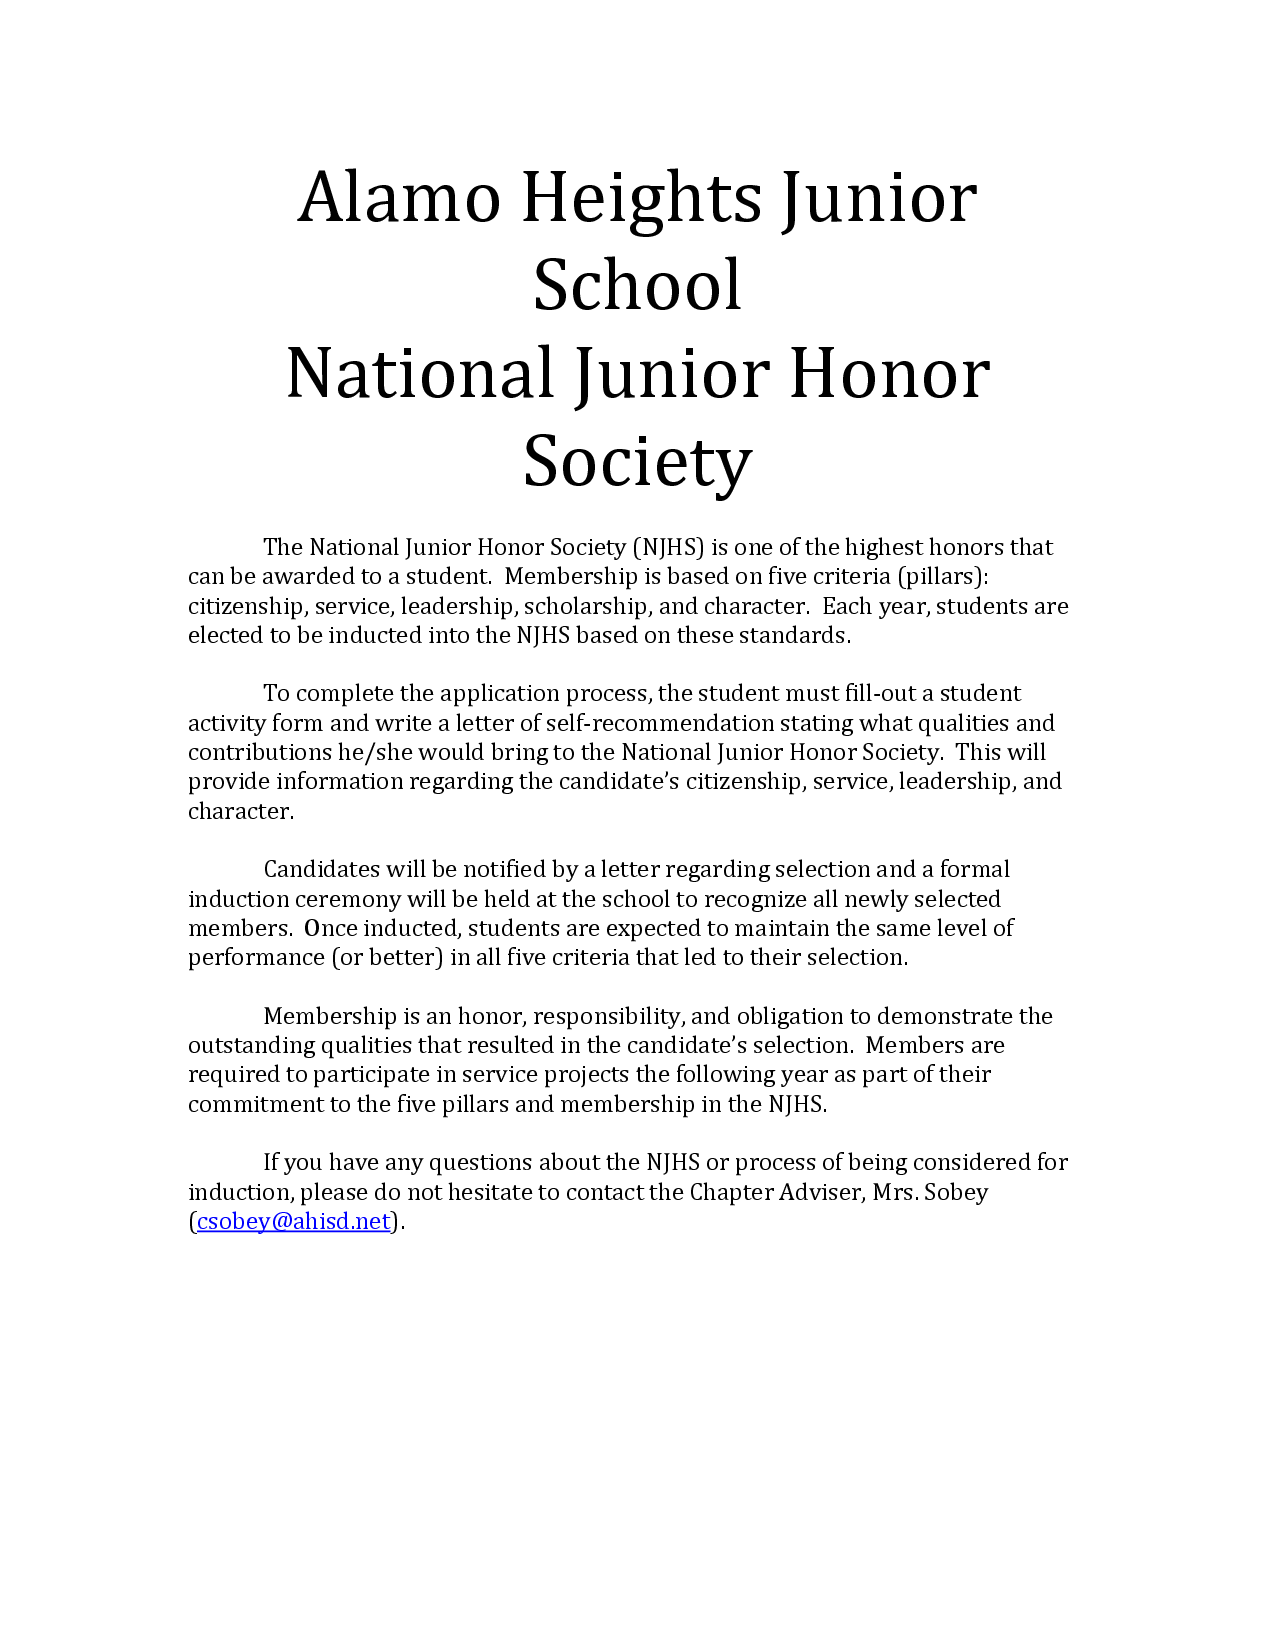 006 Essay Example National Junior Honor Society Unusual Samples Full